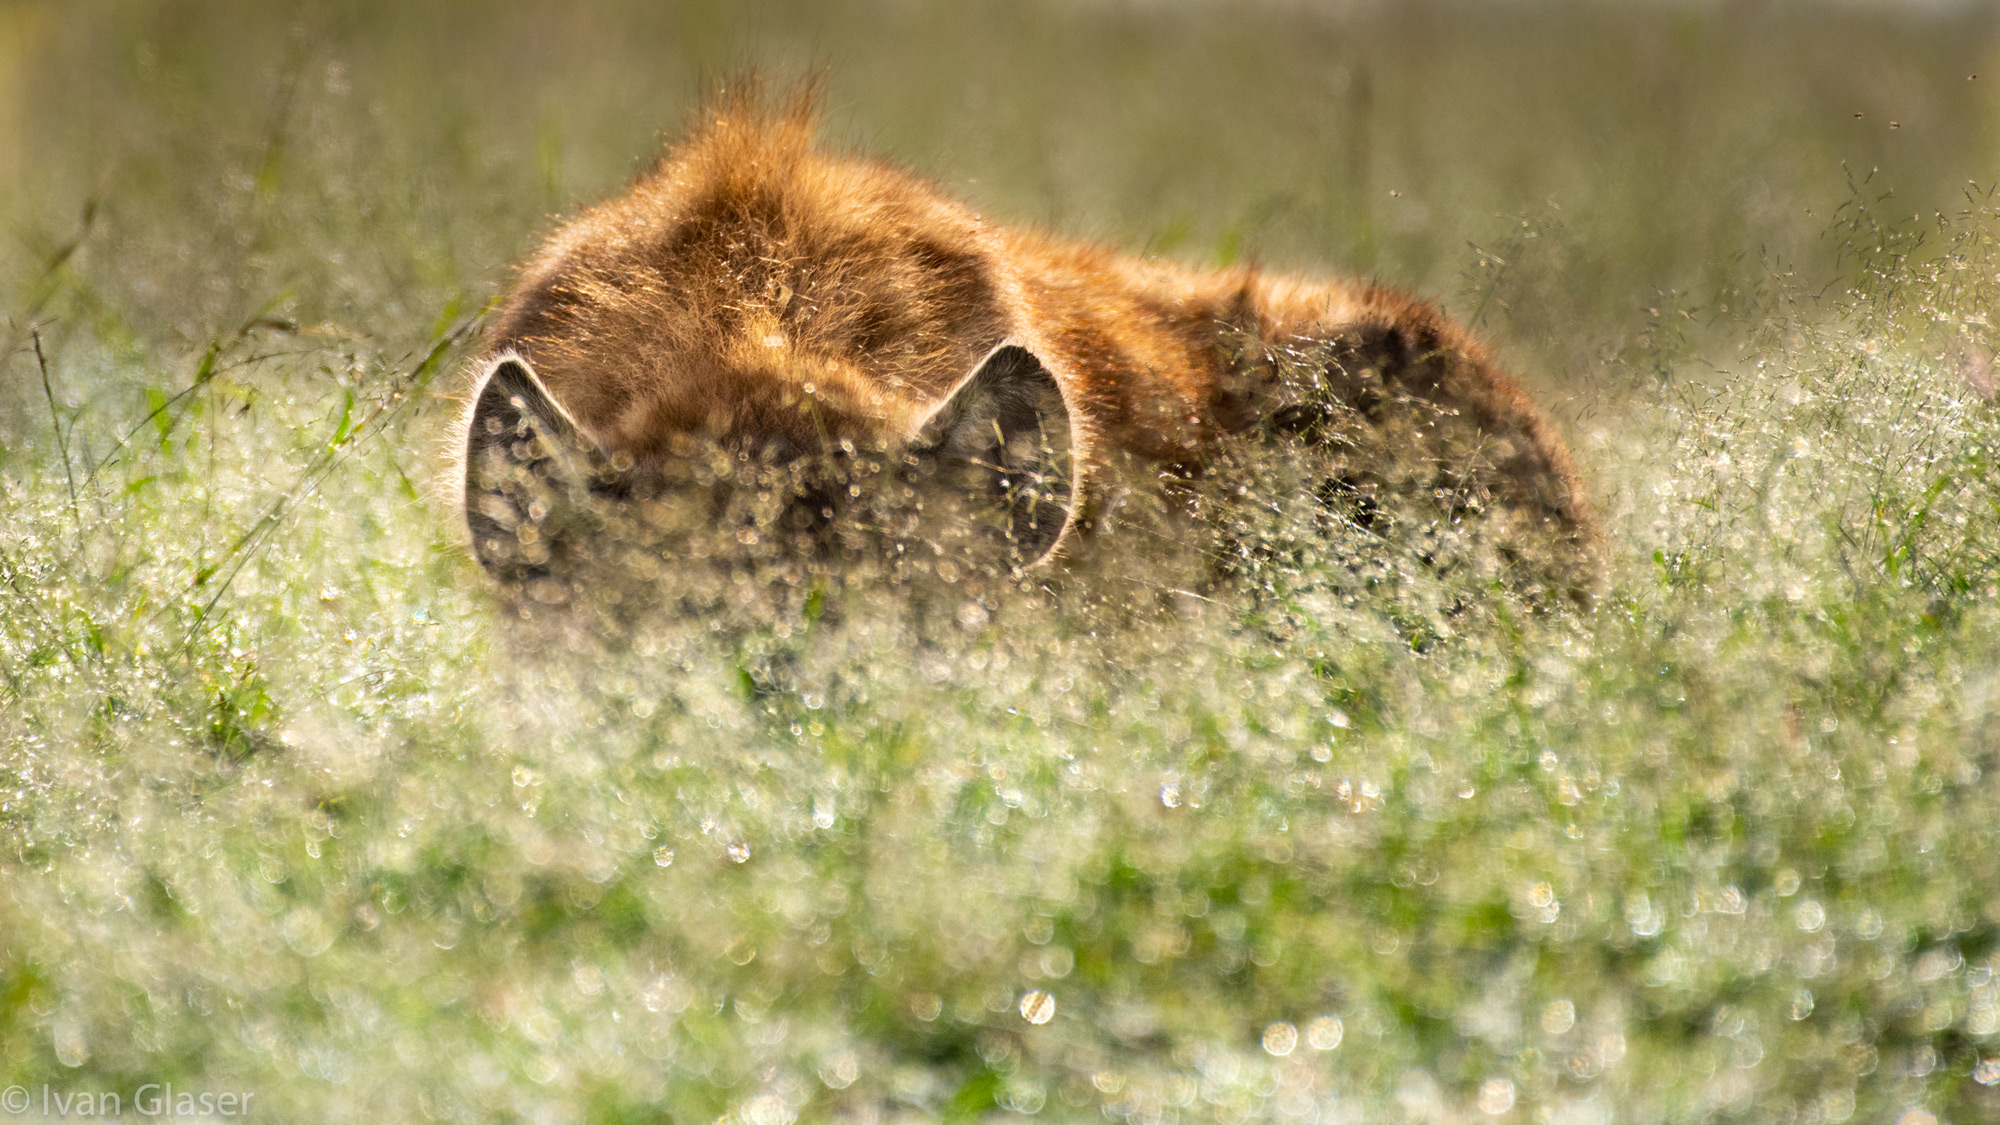 Spotted hyena in Maasai Mara